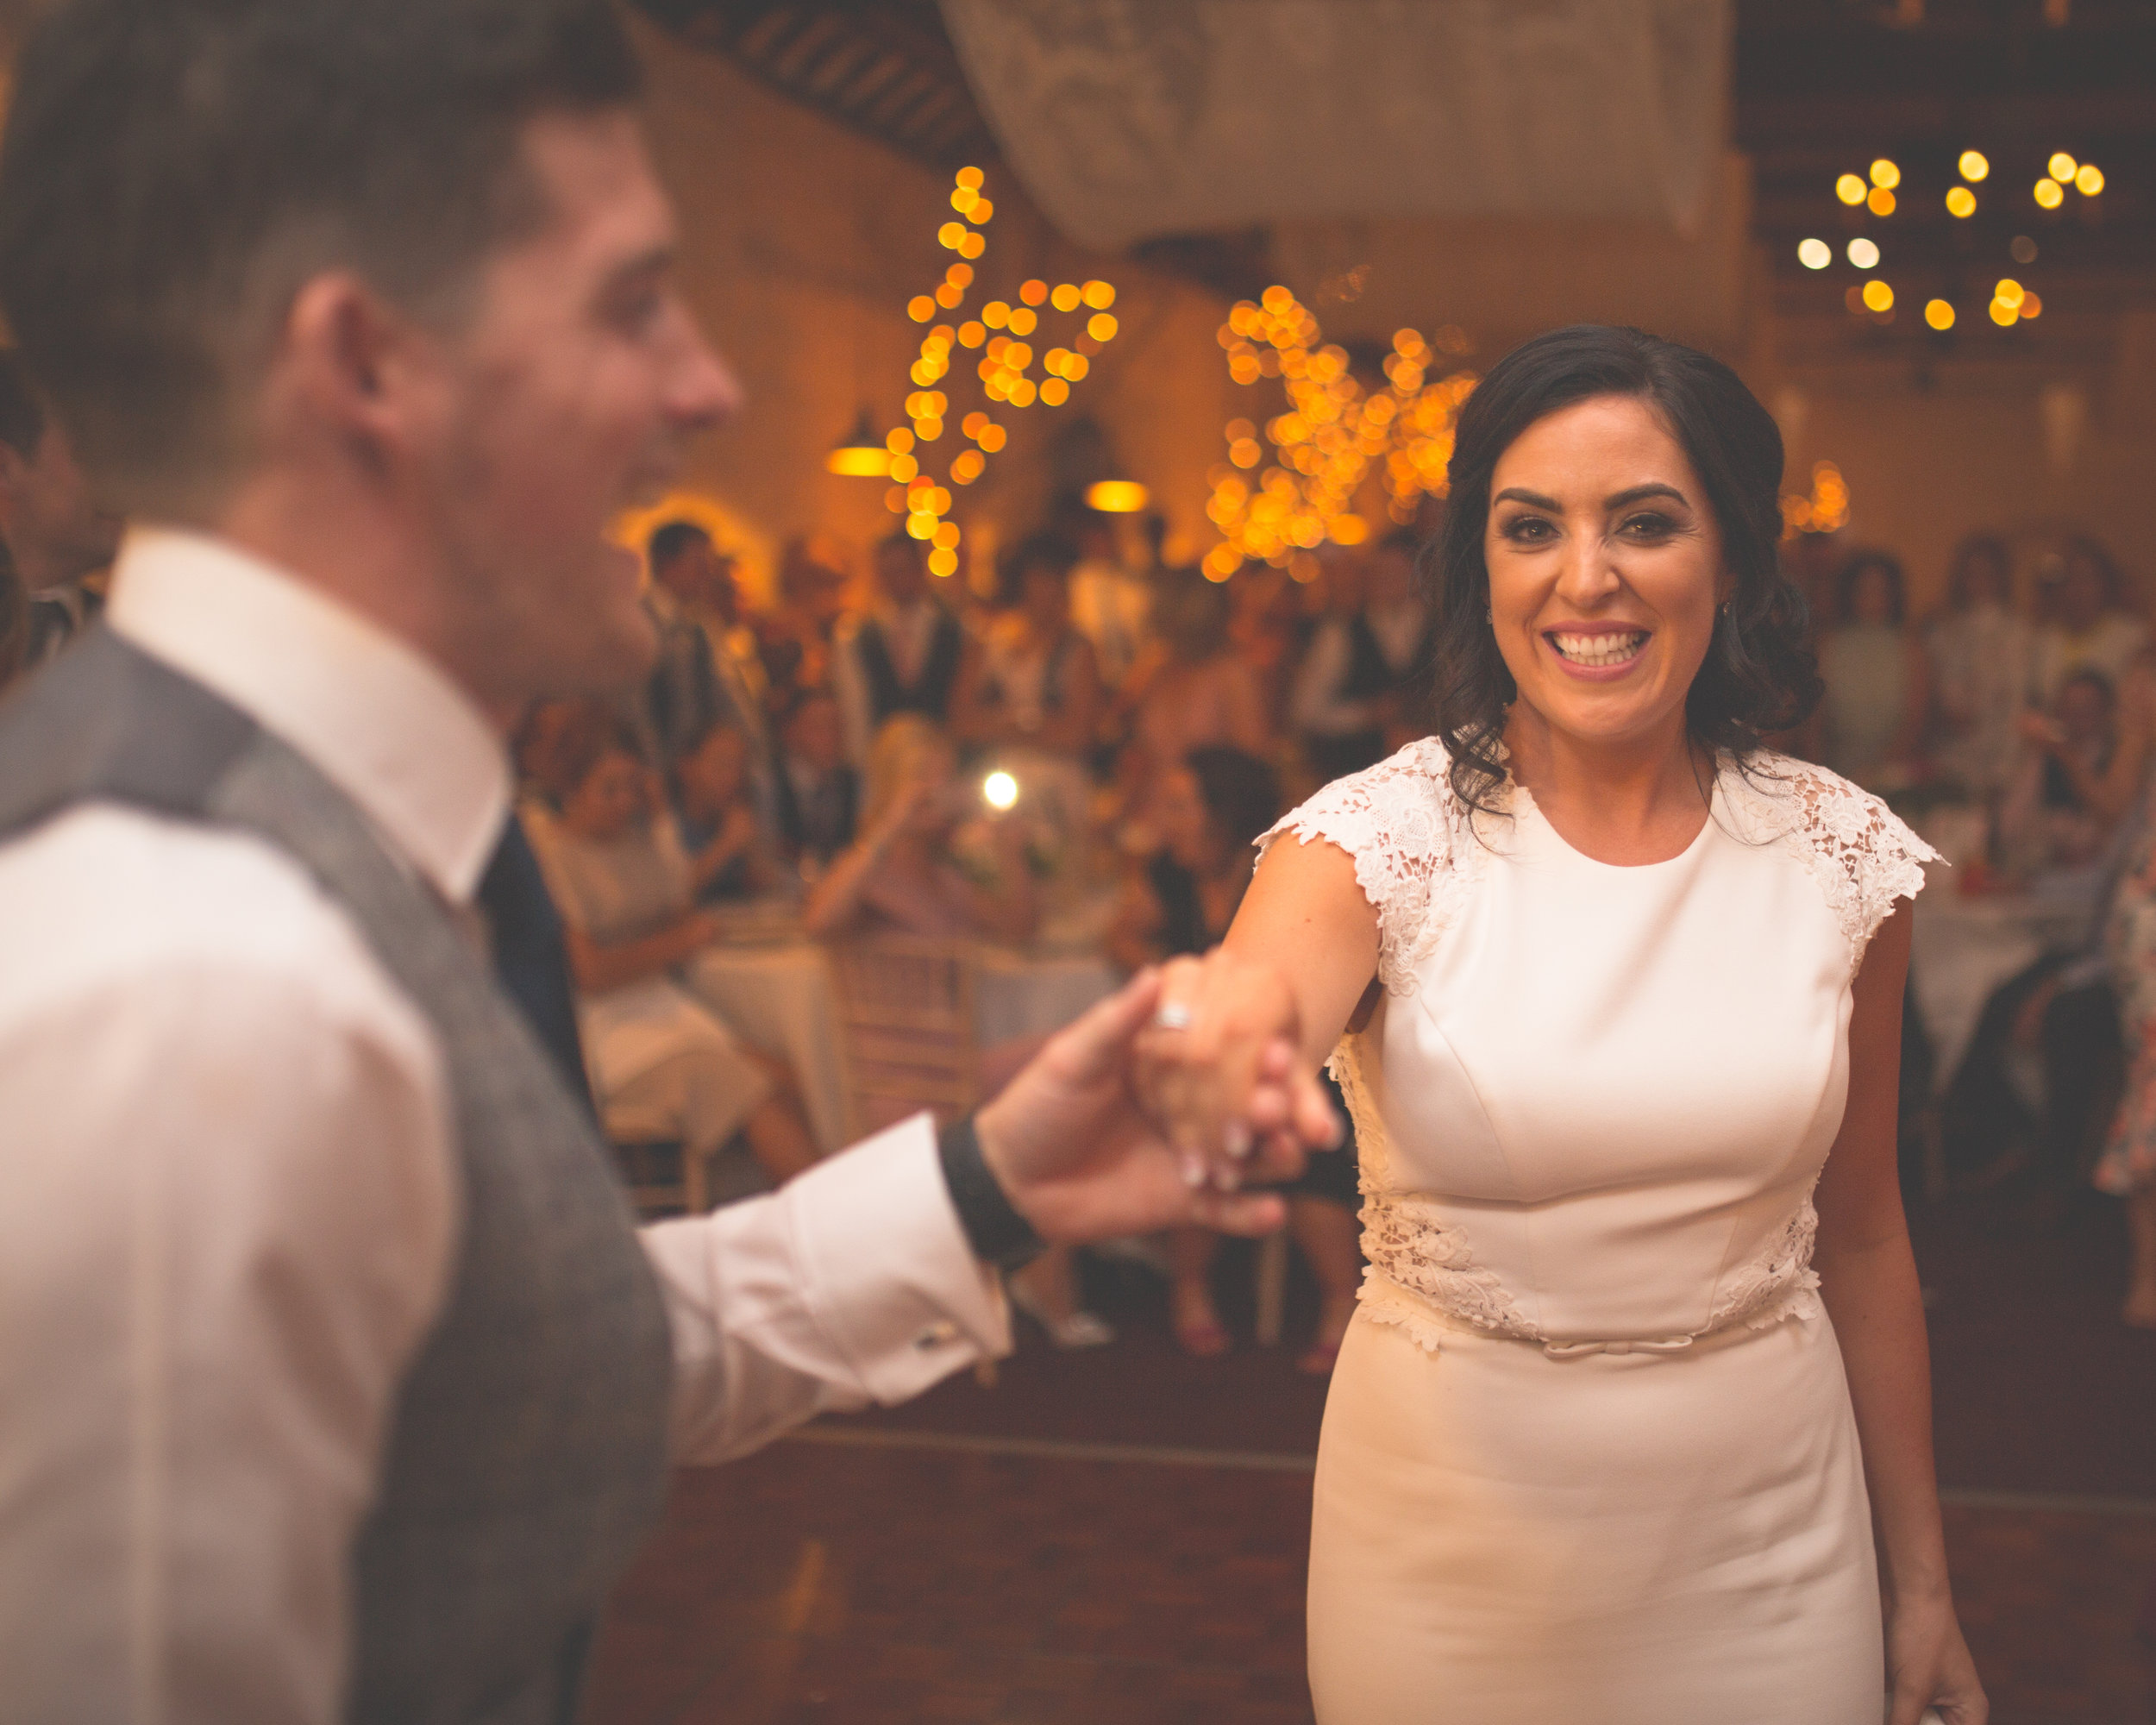 Brian McEwan Wedding Photography | Carol-Annee & Sean | The Dancing-34.jpg